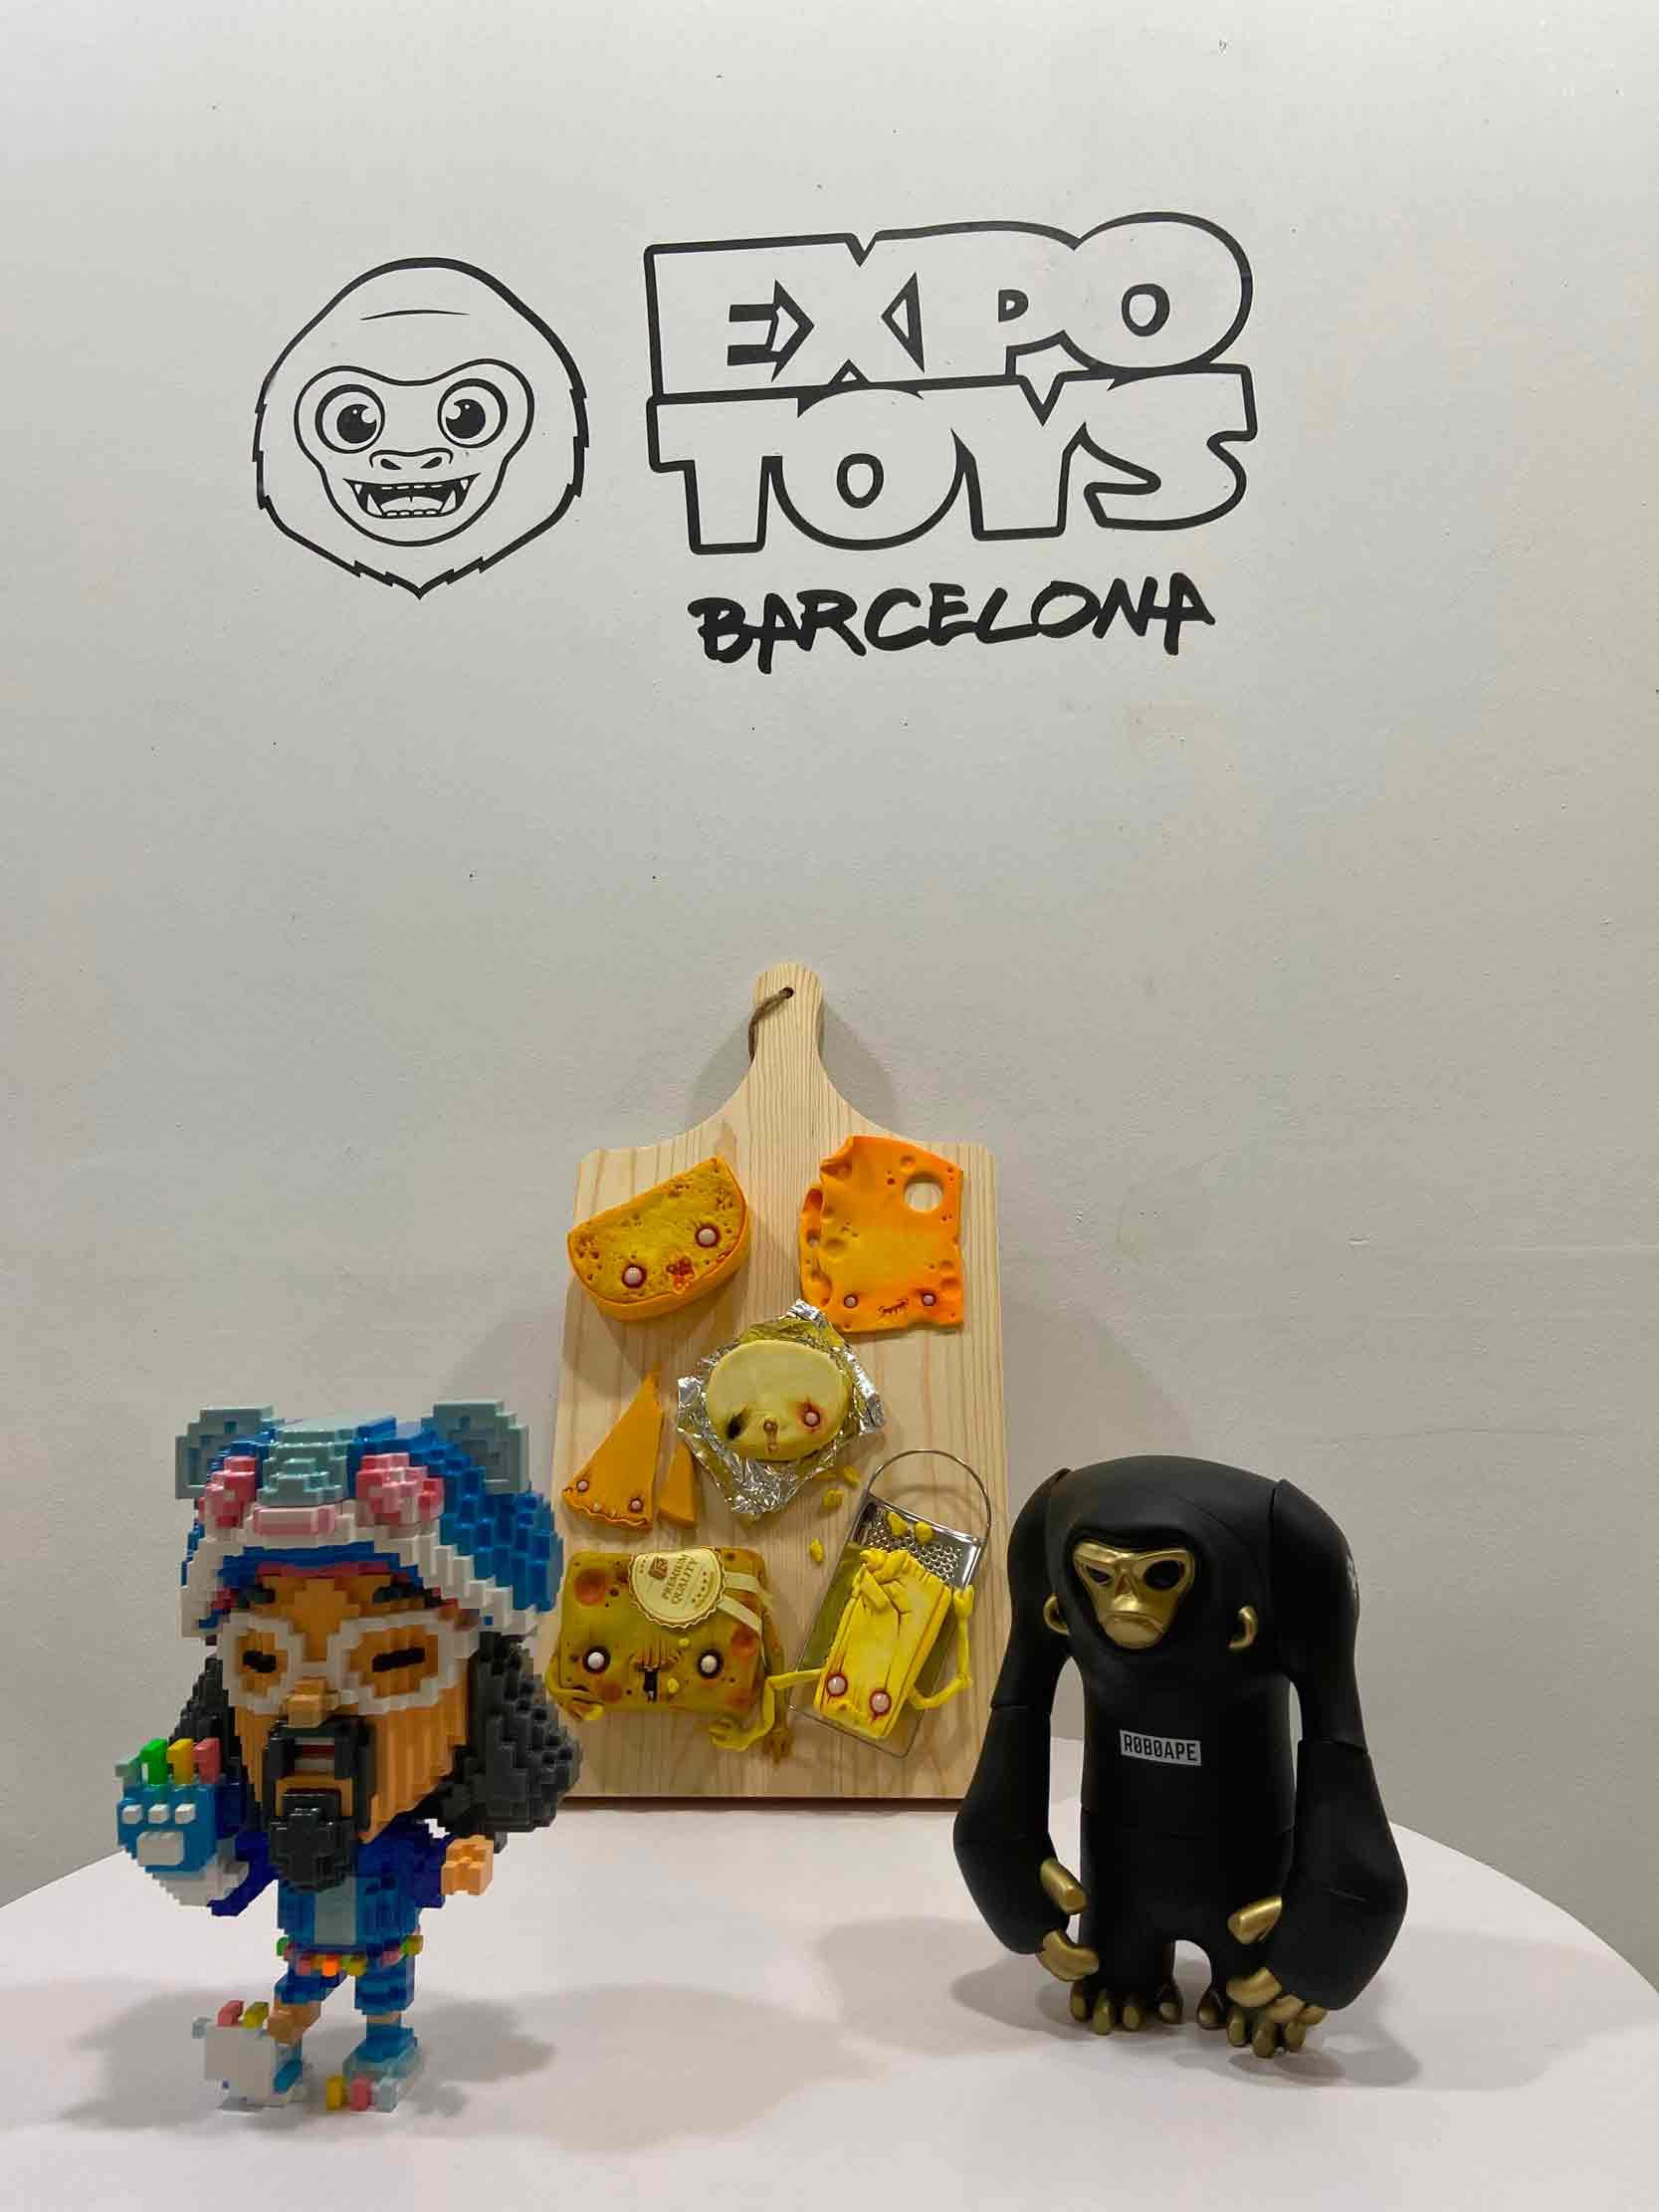 arte urbano expotoys 2020 Barcelona